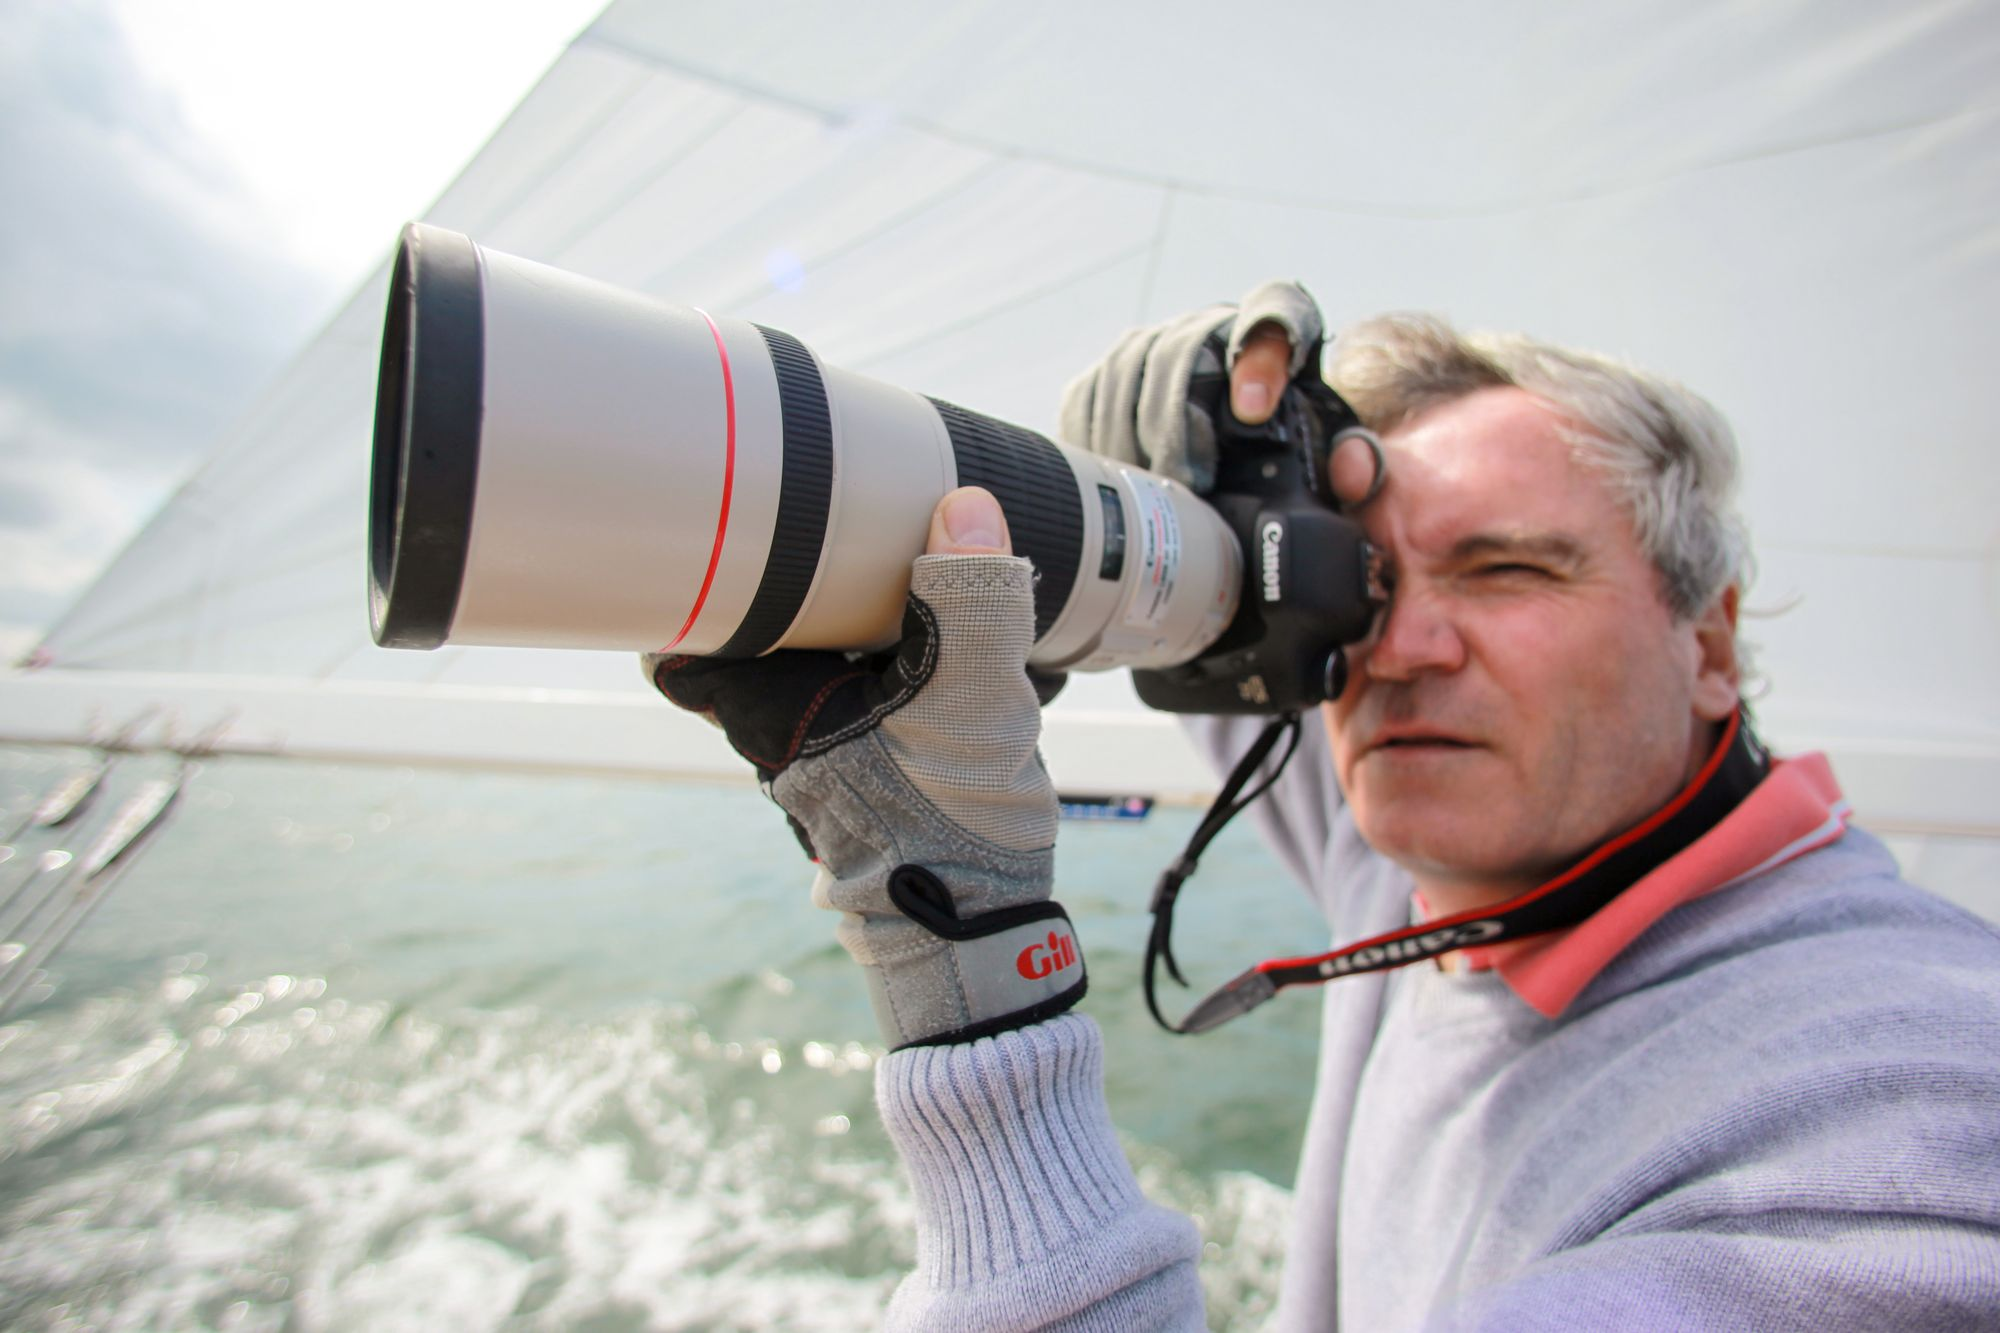 Fotograf Svend Krumnacker 2011 Canon 5D II 300mm/4.0 L